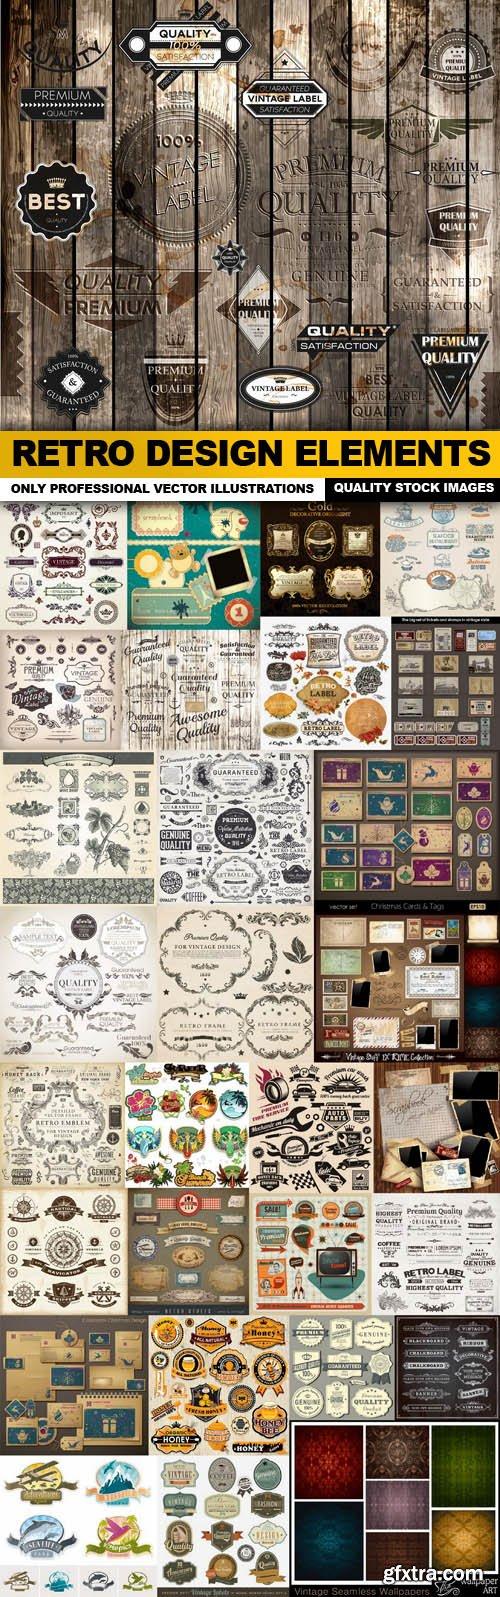 Retro Design Elements - 30 Vector